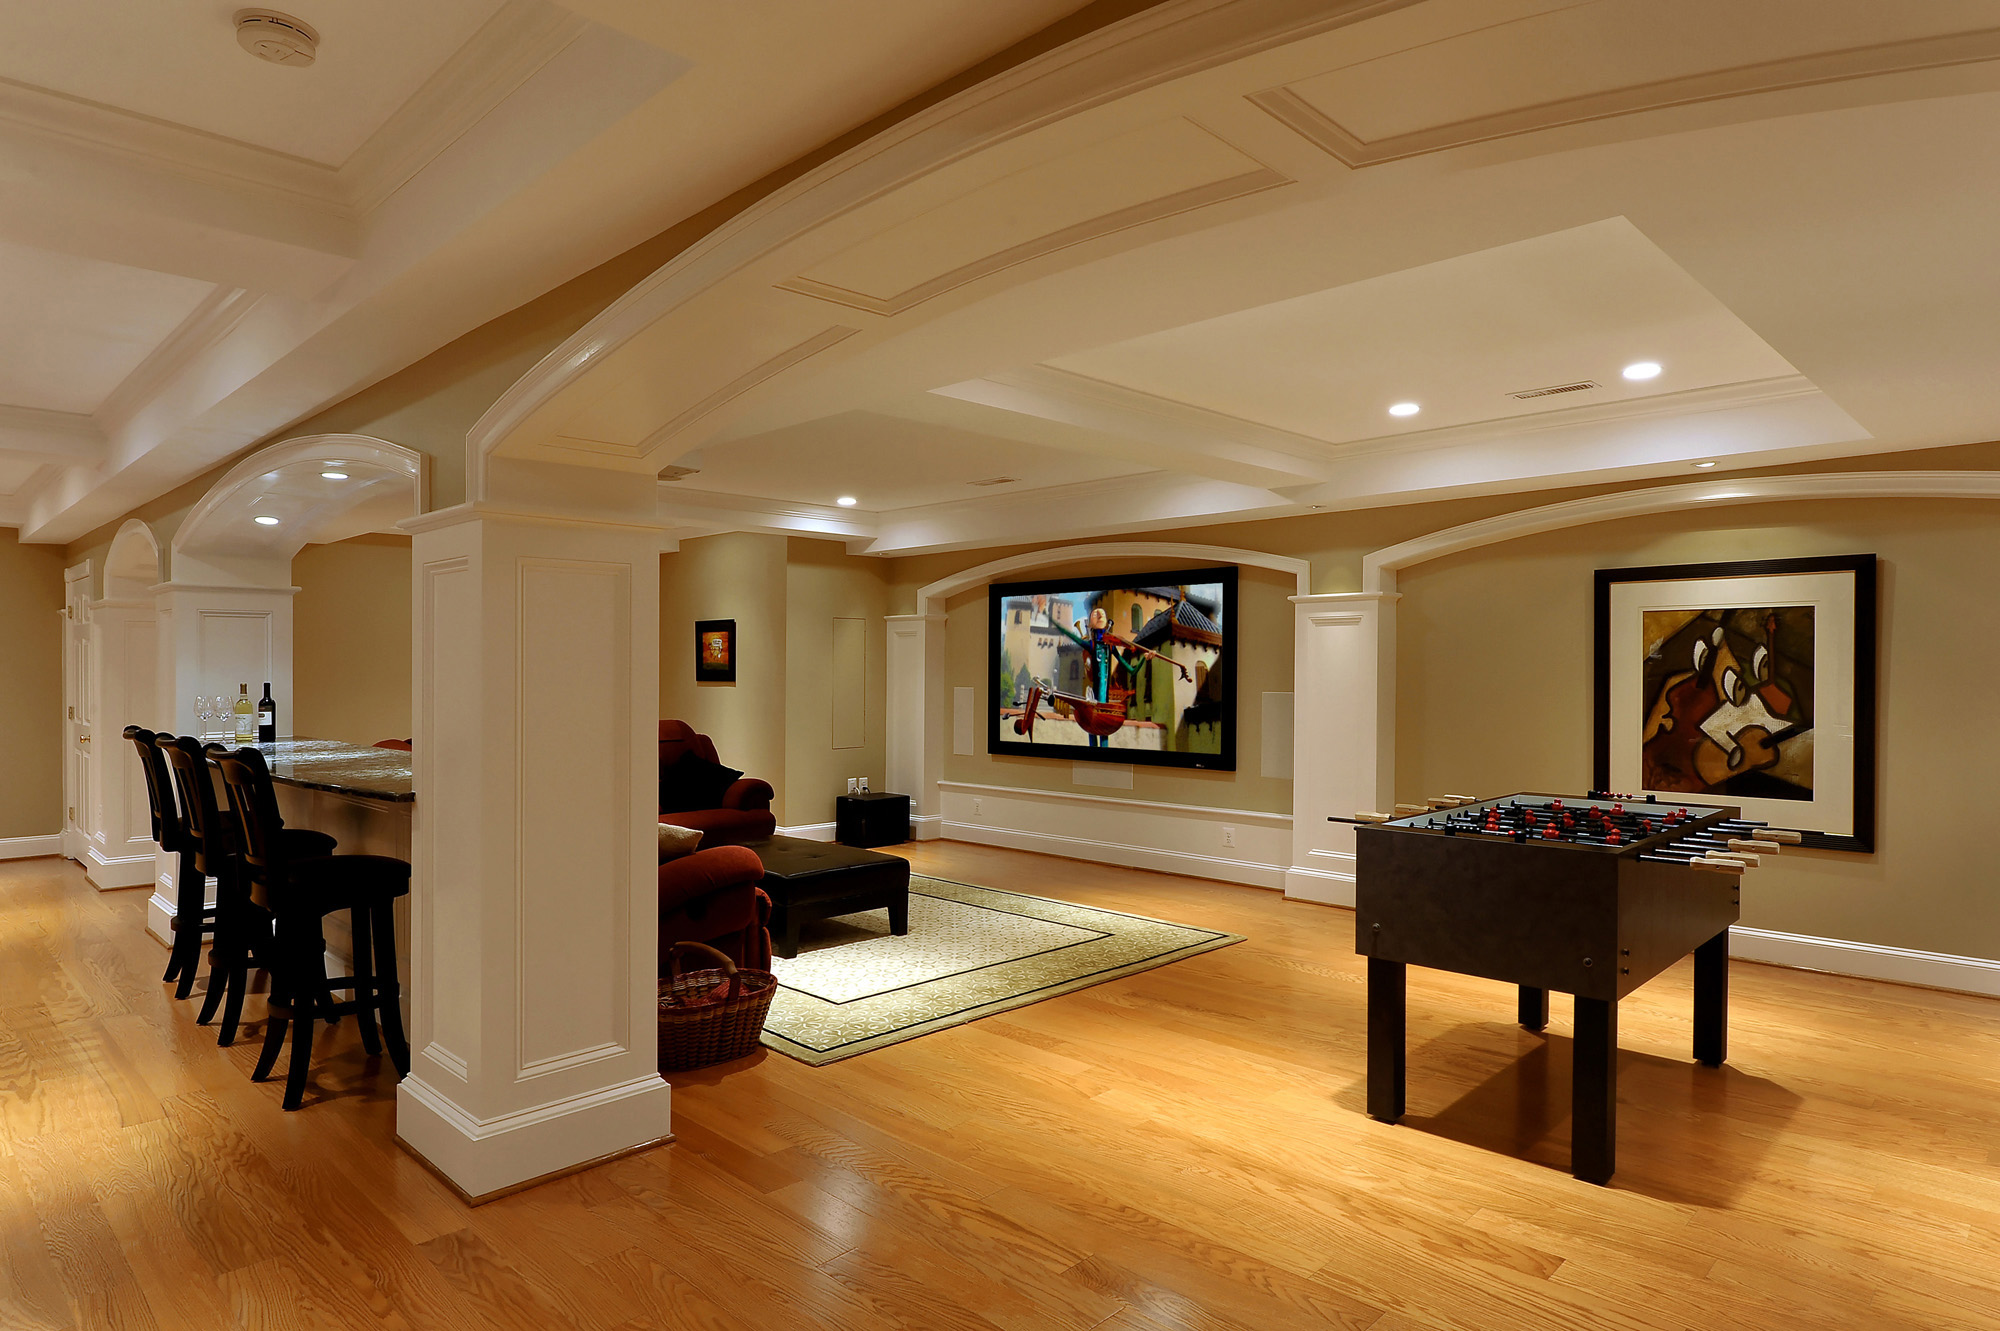 Lower Level Renovation Creates Wonderful Spaces For Ashburn Virginia Family Bowa